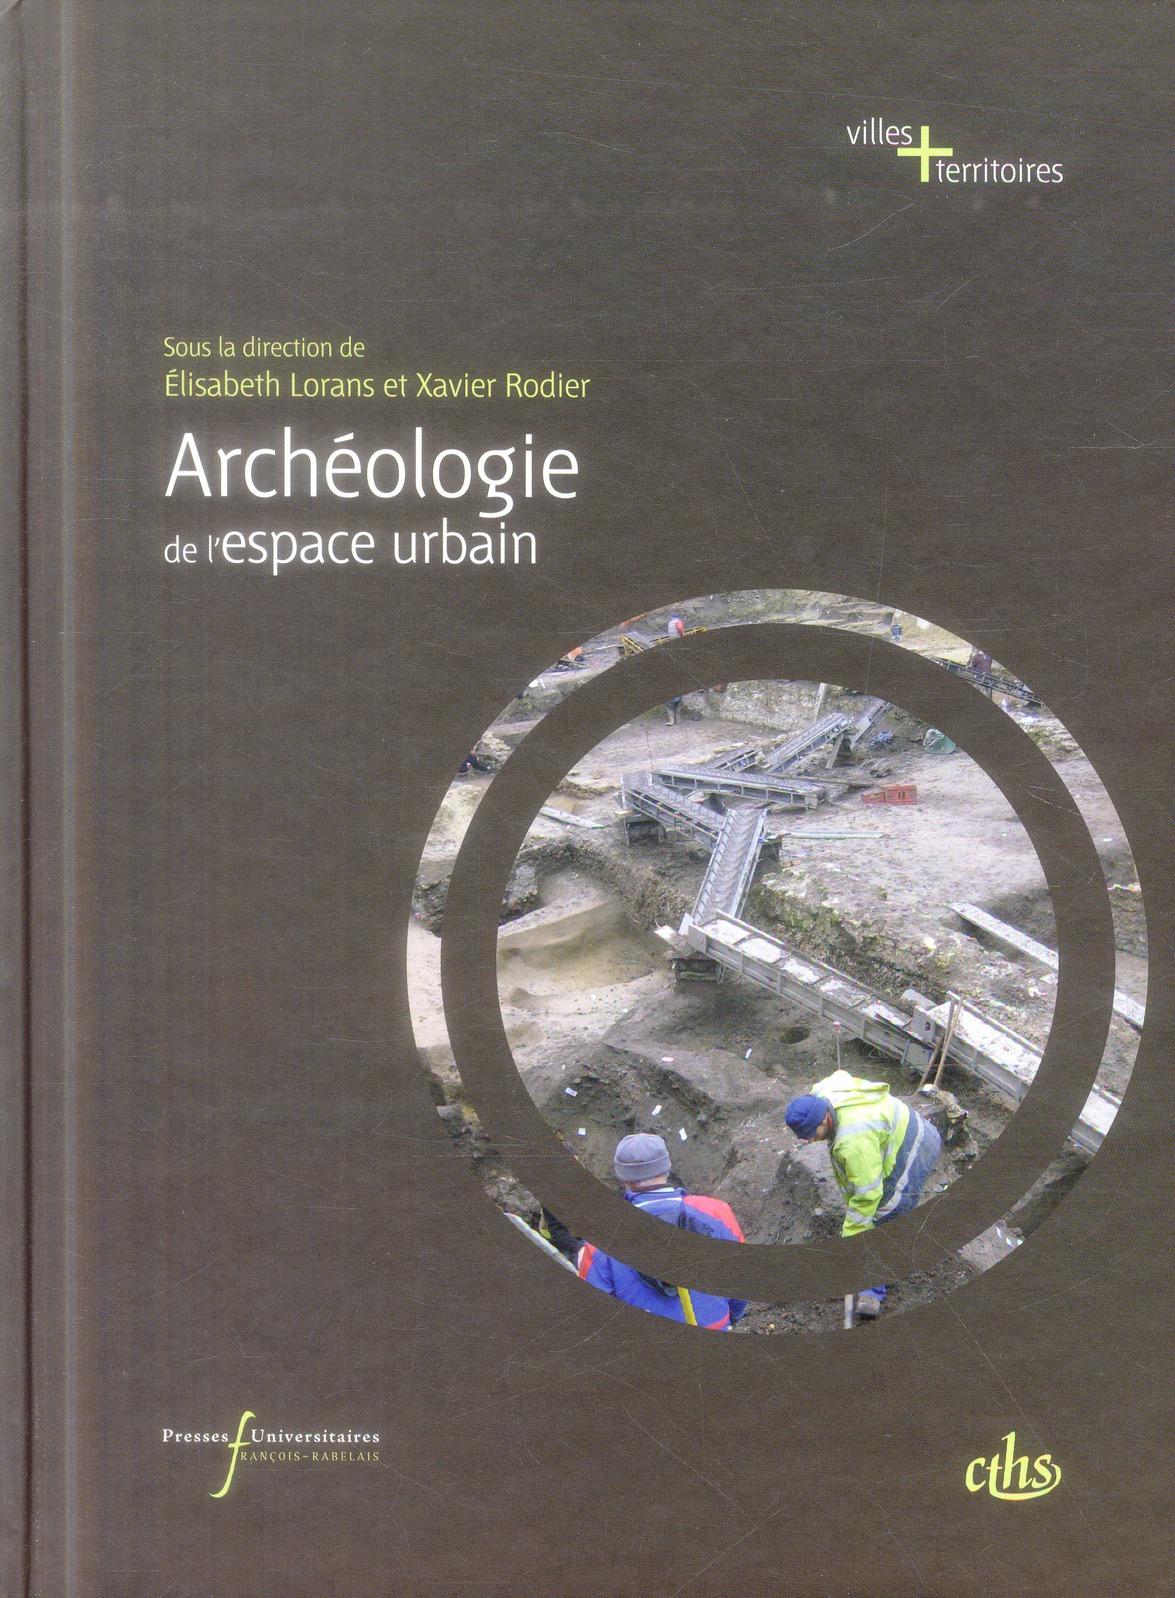 Archeologie de l'espace urbain